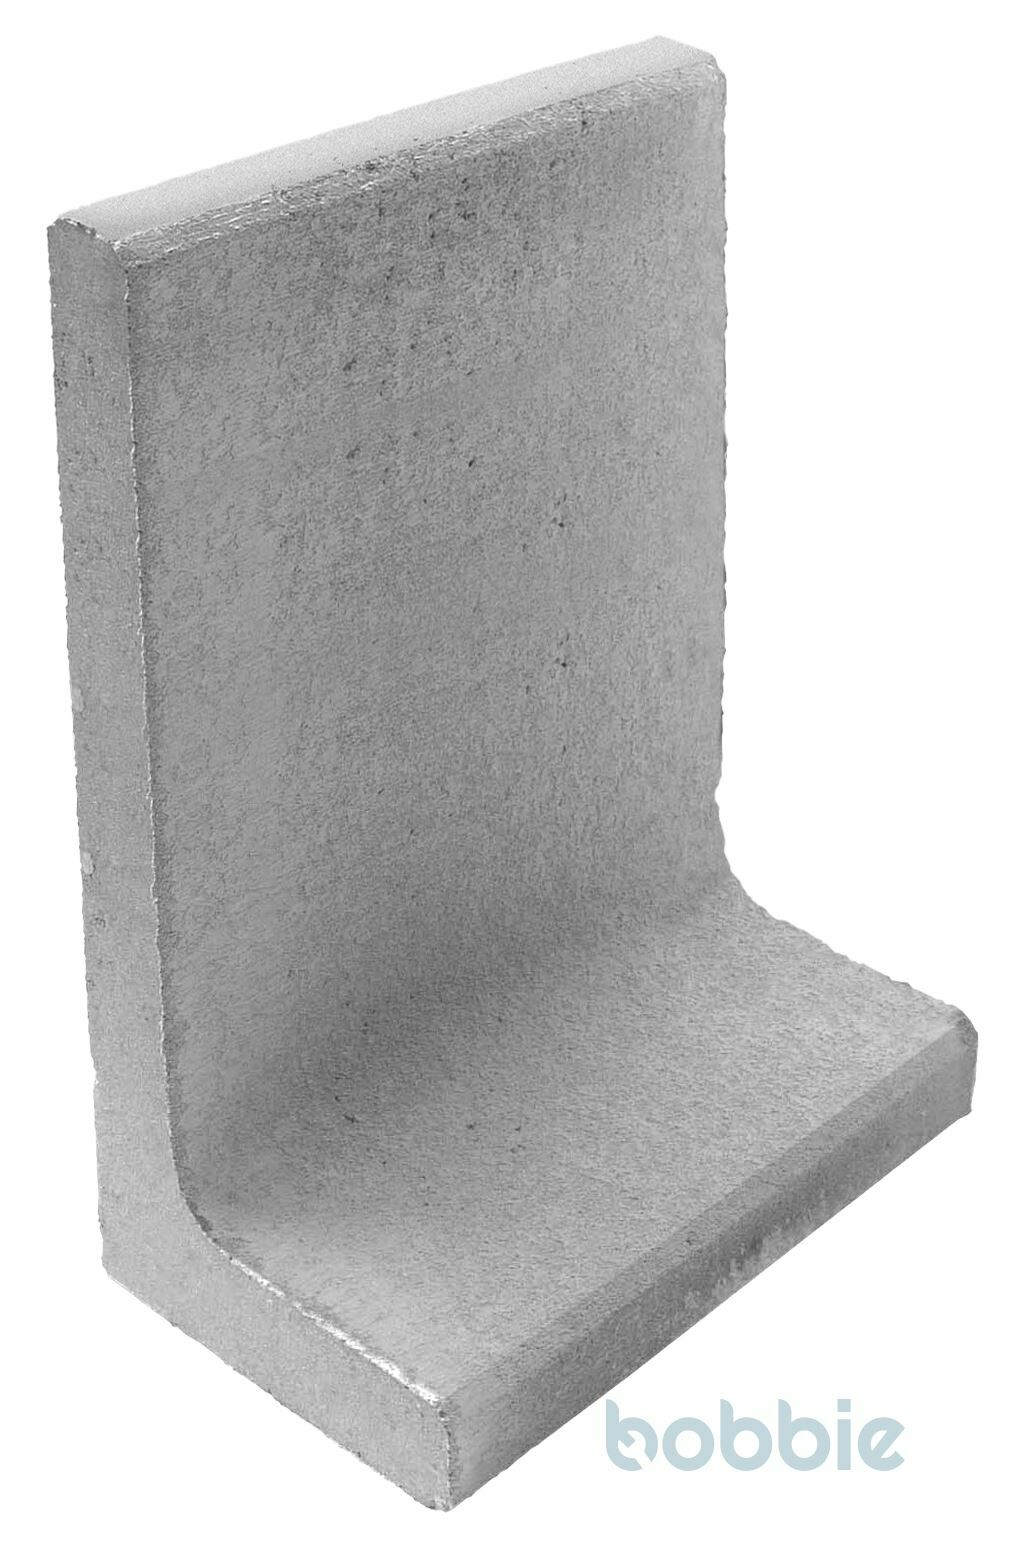 DIEPHAUS L-STEIN GRAU 80/50/50/7 CM